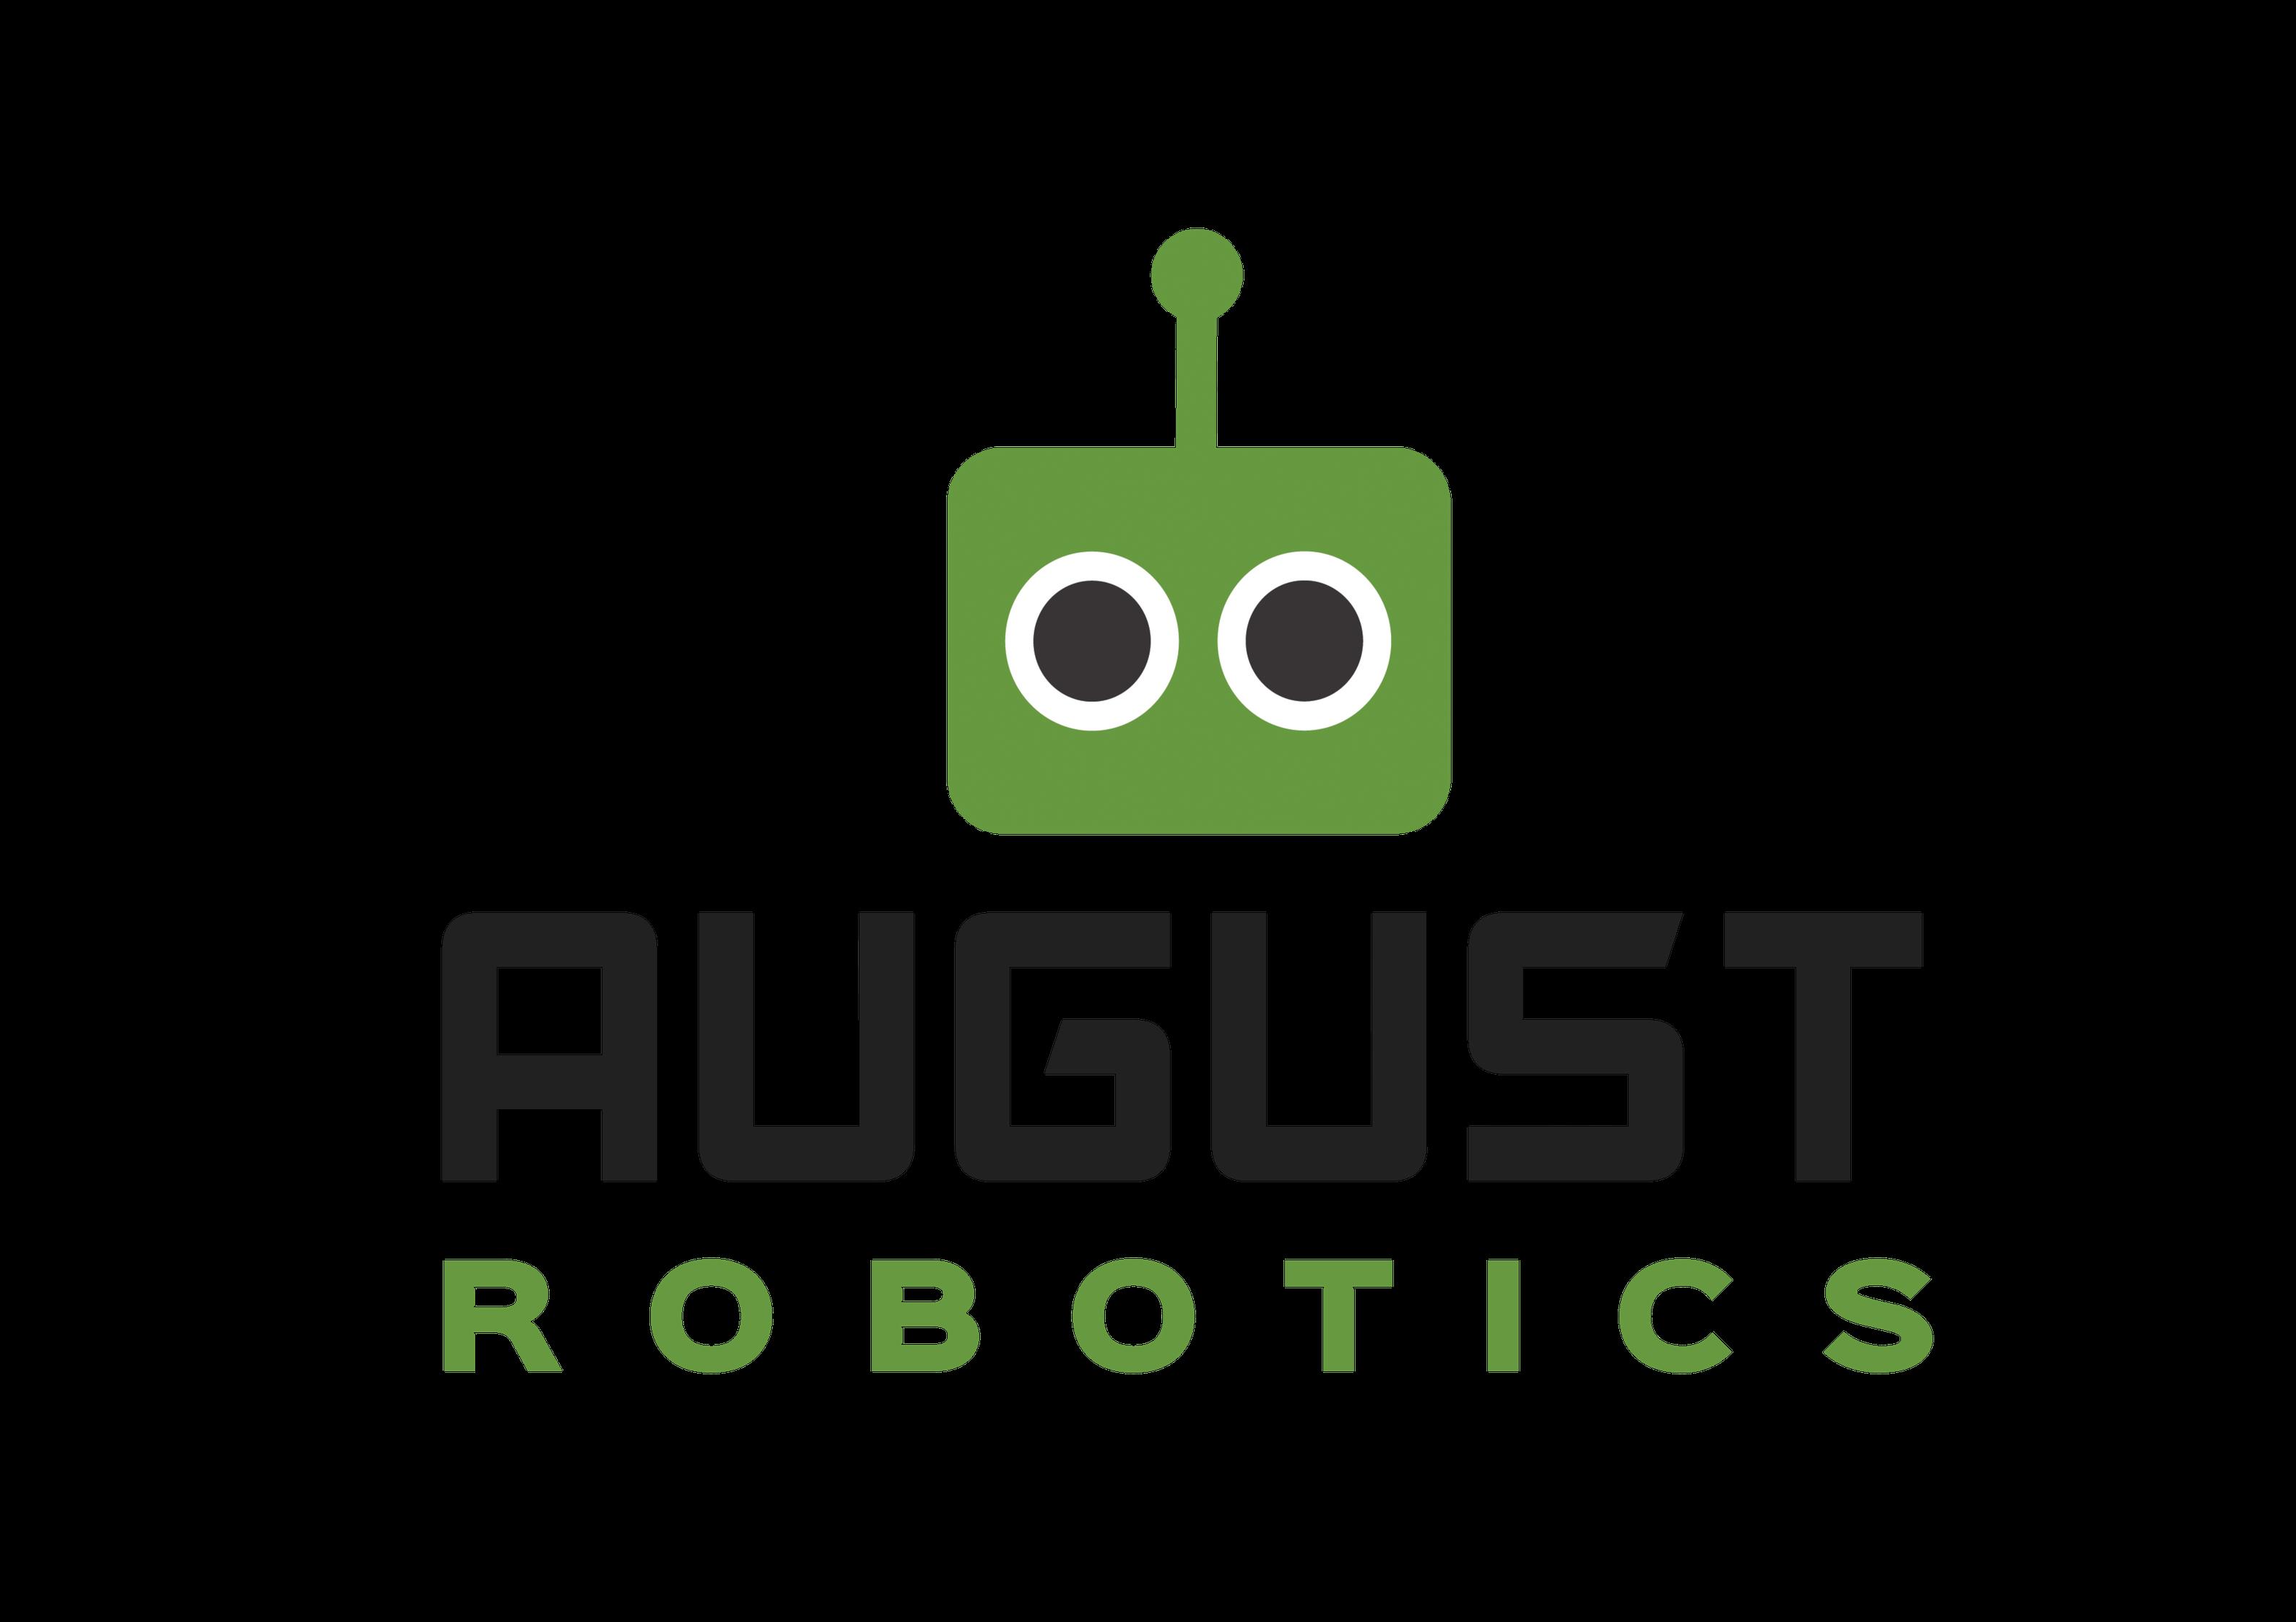 August Robotics Limited